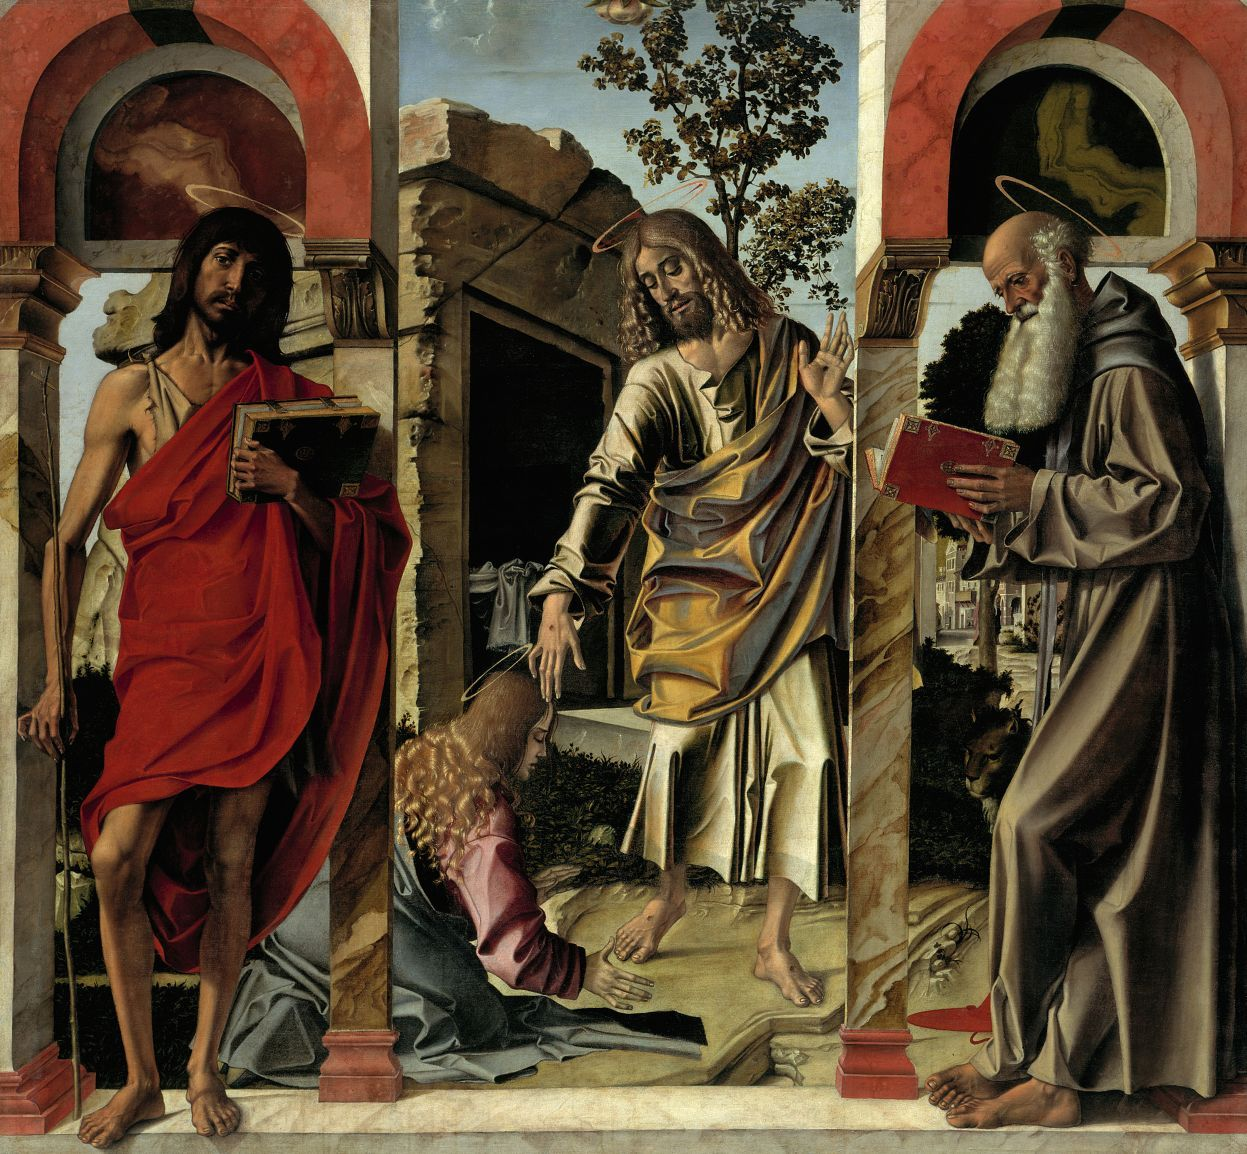 Bartolomeo Montagna: Der auferstandene Christus mit Maria Magdalena © bpk / Gemäldegalerie, SMB / Jörg P. Anders